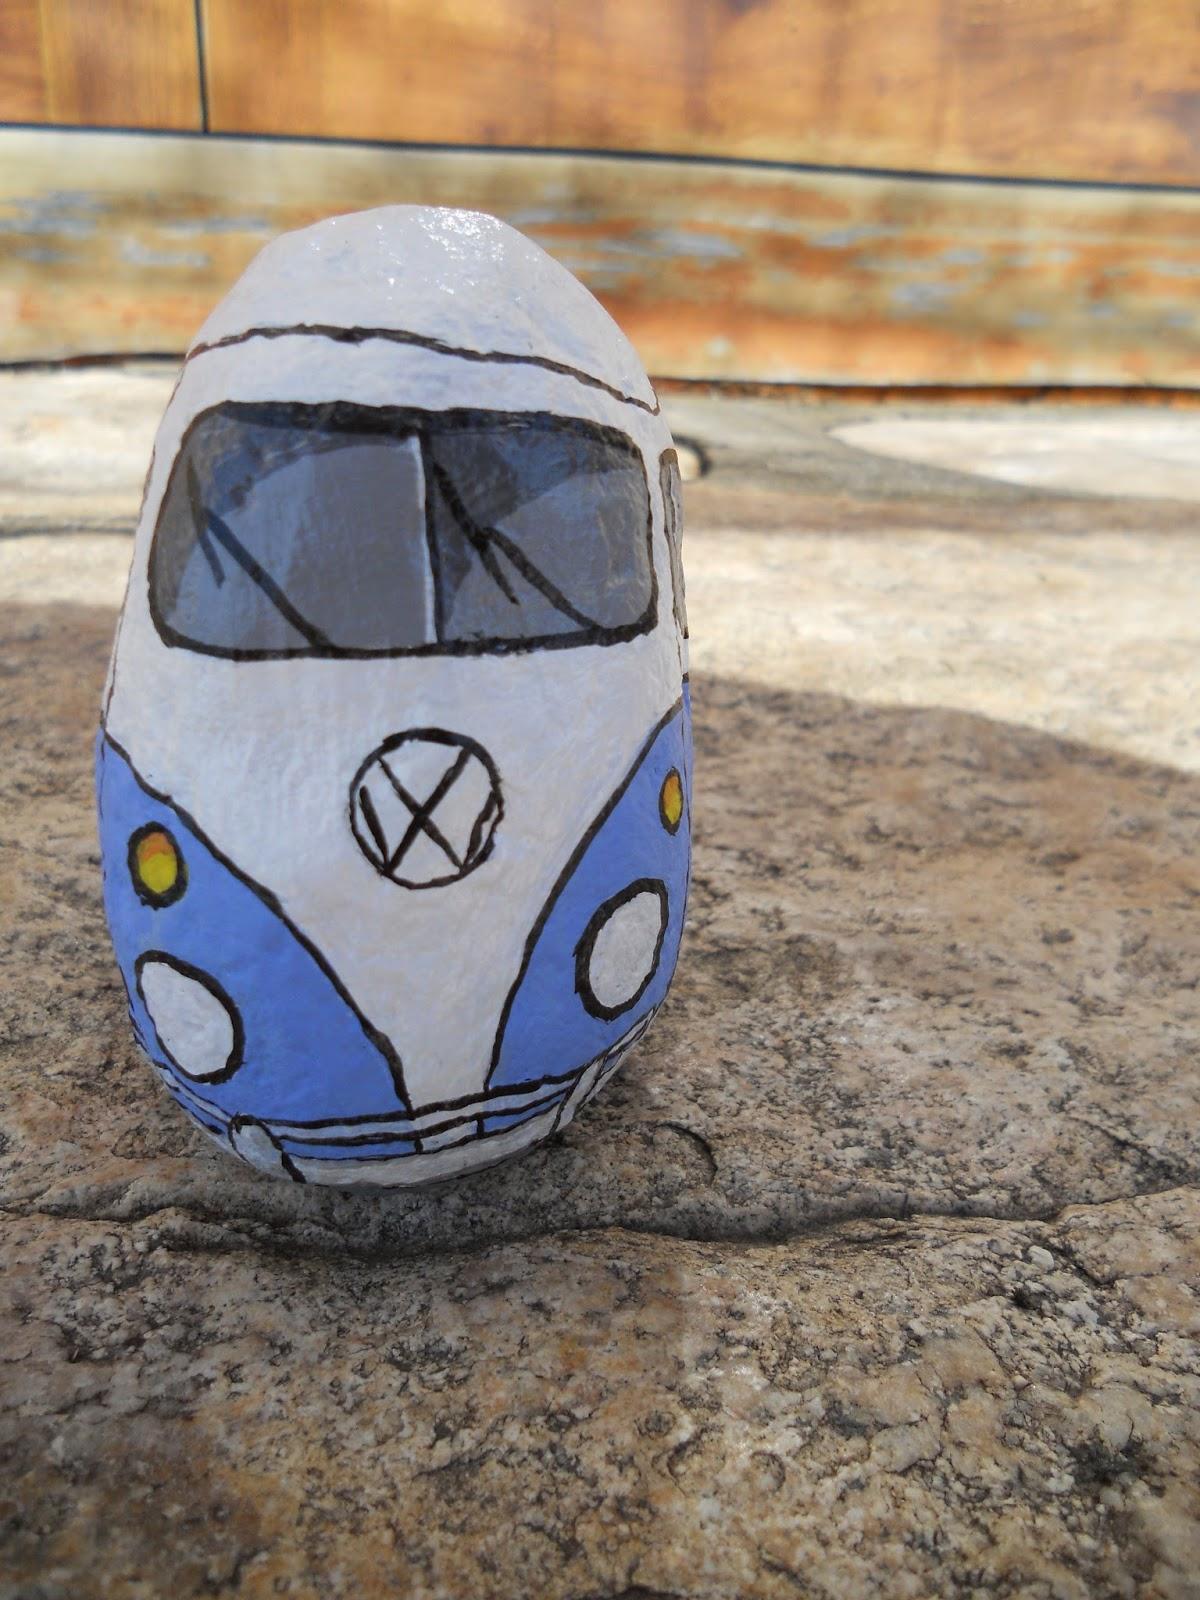 piedra pintada Volkswagen camper, furgoneta vw o furgoneta hippie